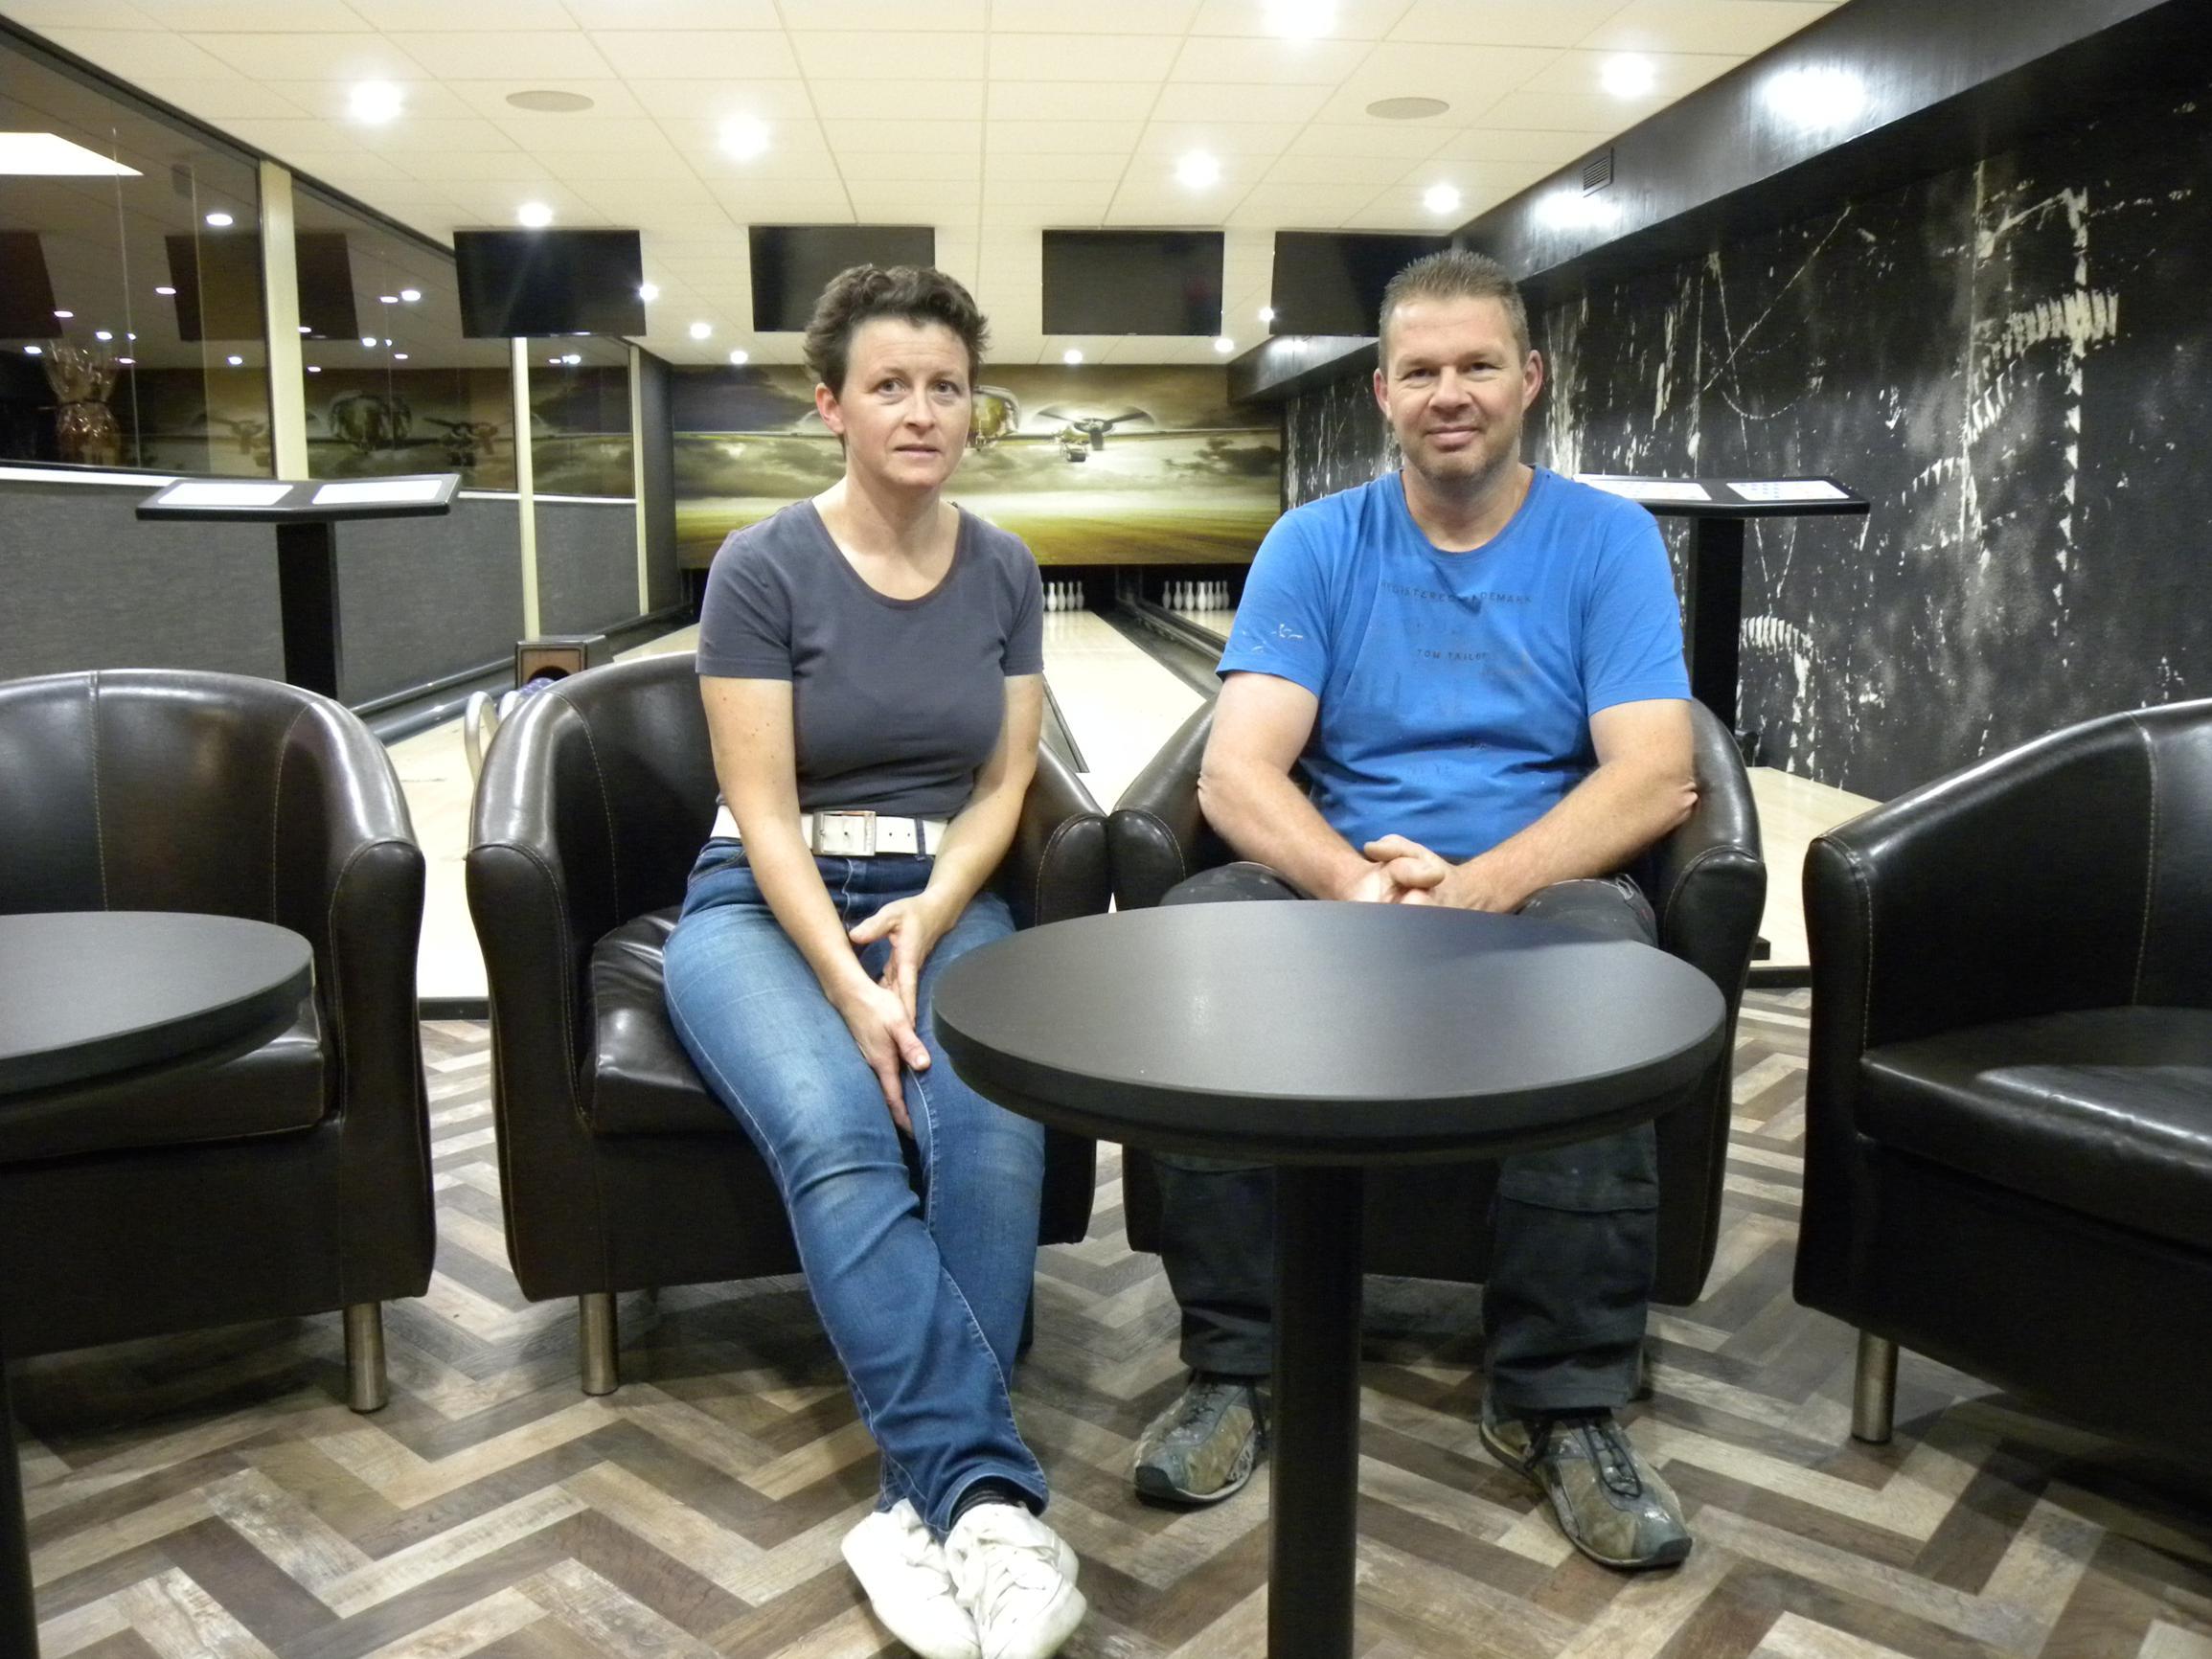 Nieuwe zaak is lunchbar, bowling én feestzaal